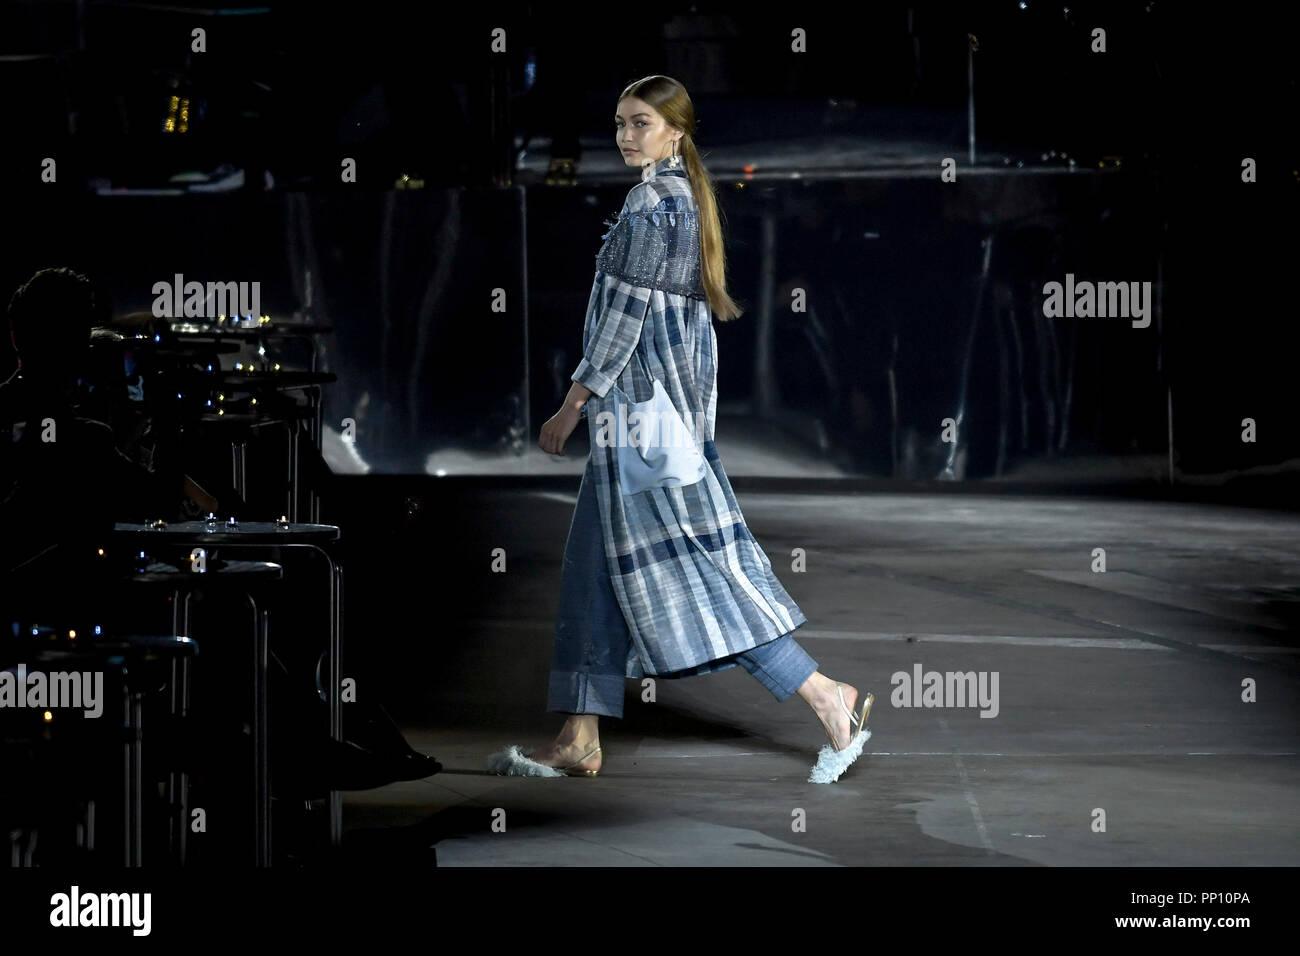 ad2ee5cab817 Milan Fashion Week Fashion Women Spring Summer 2019. Missoni fashion show  In the photo: Gigi Hadid Credit: Independent Photo Agency/Alamy Live News